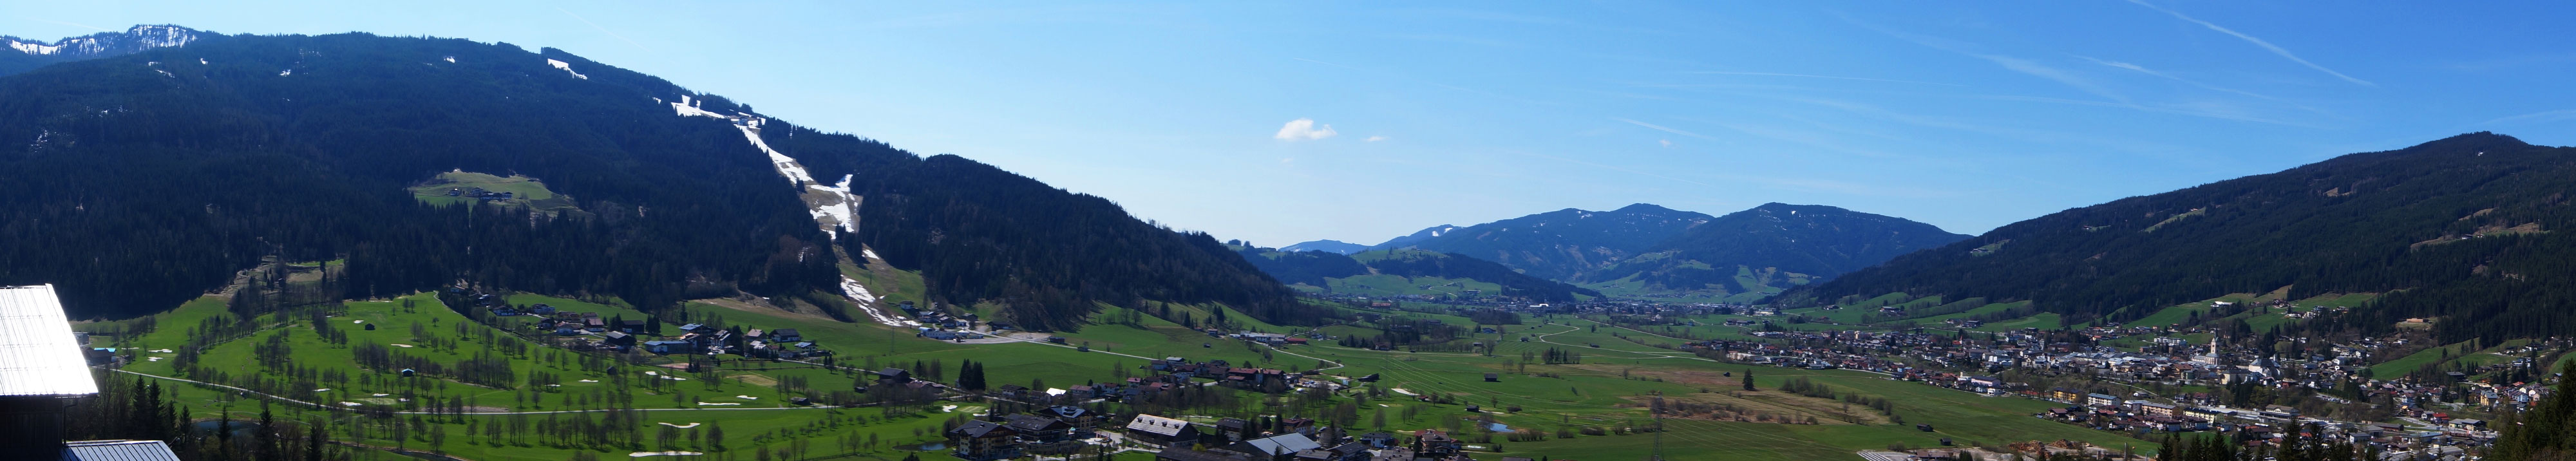 panoramasauschneidfruehling